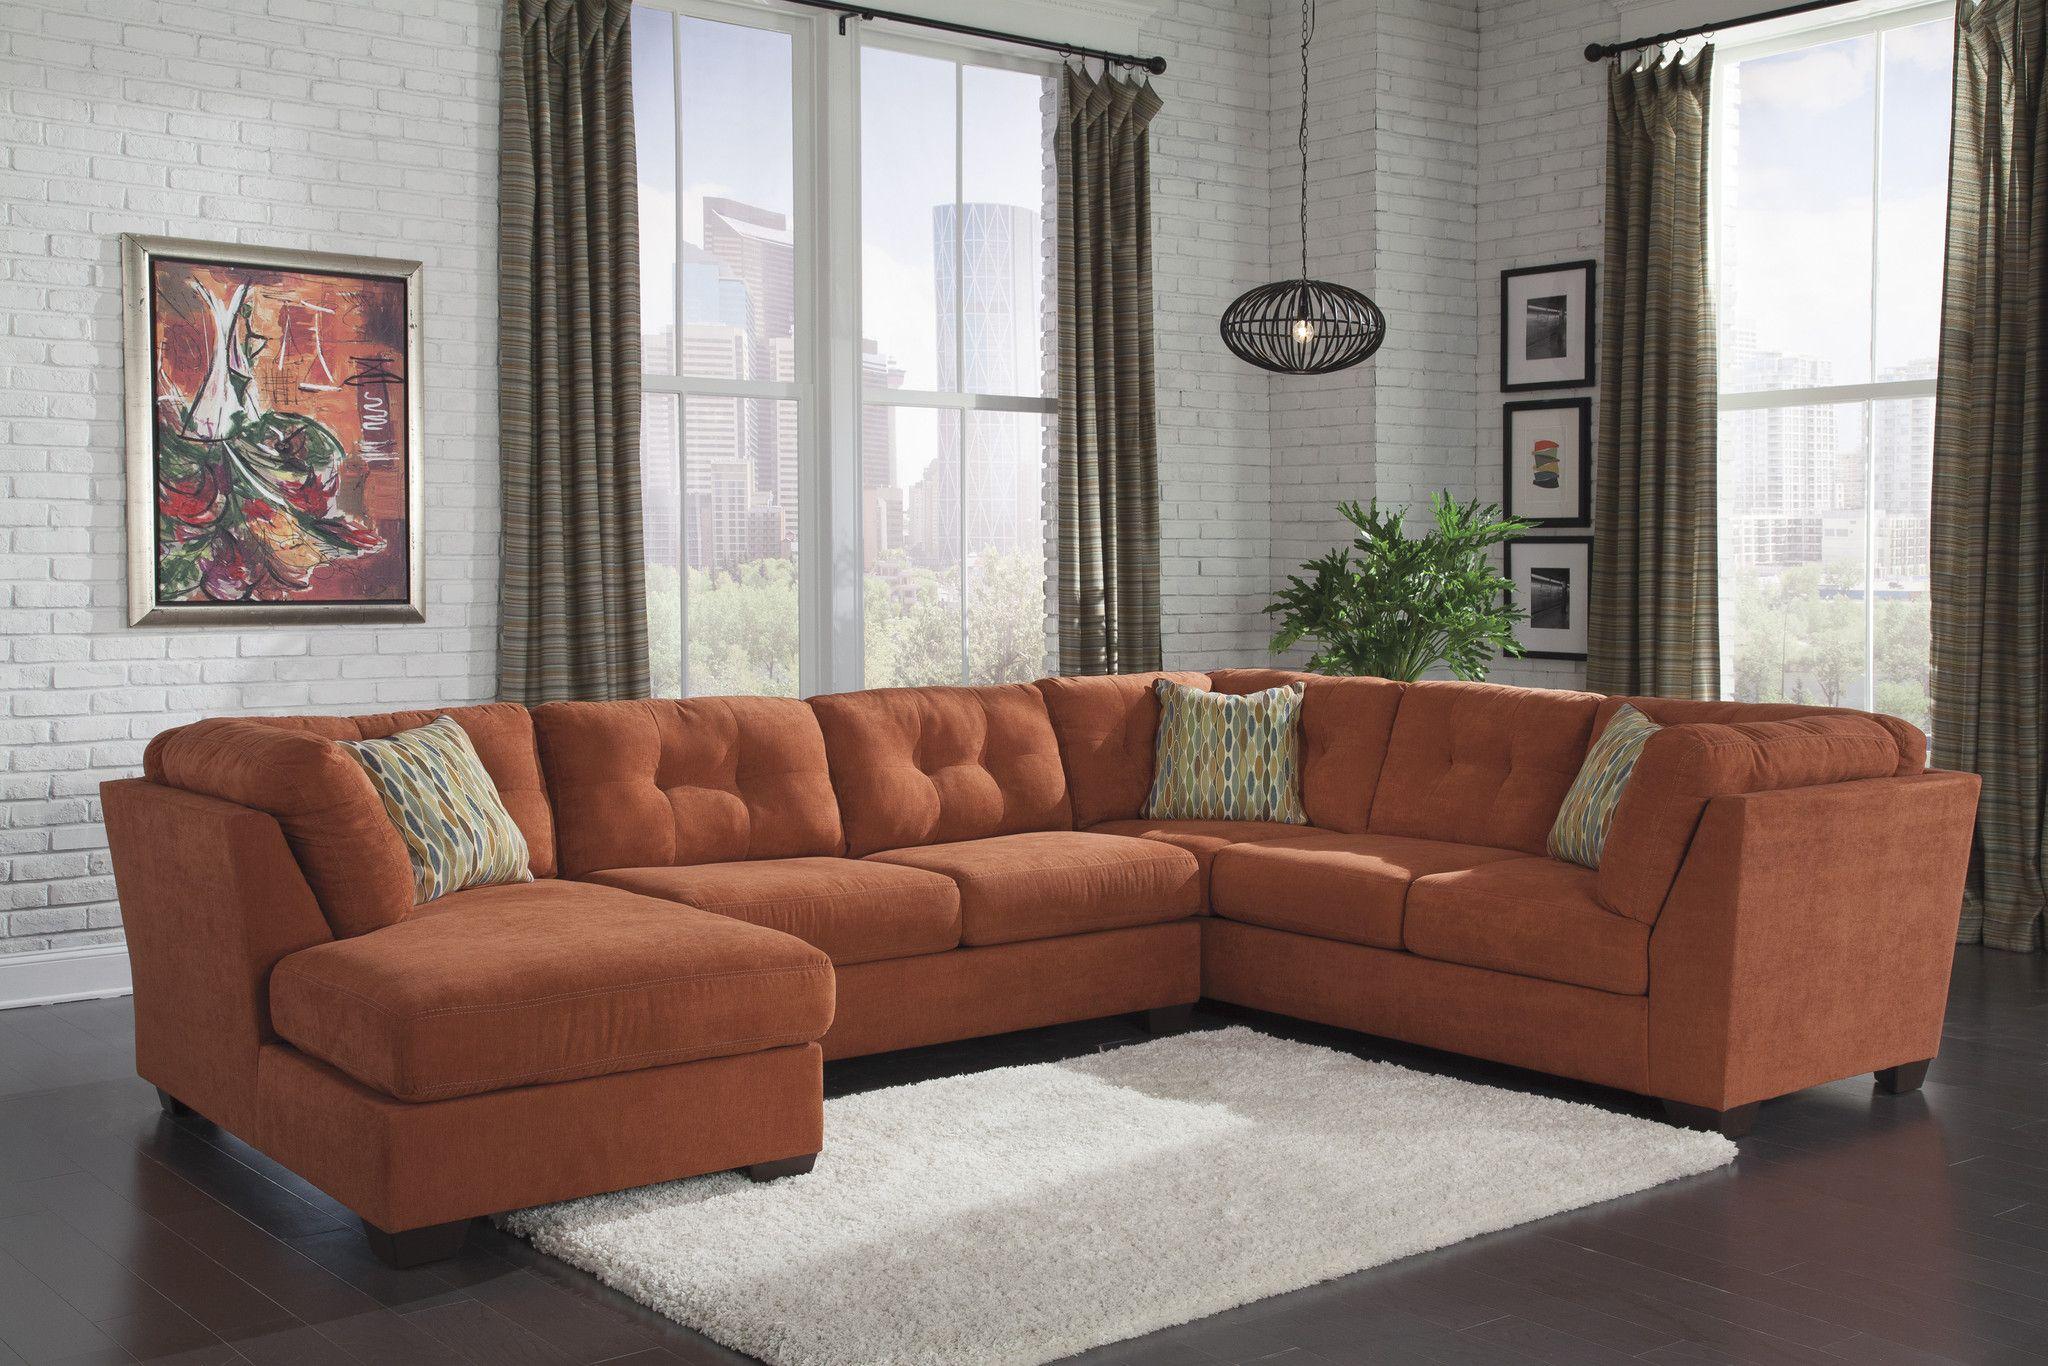 Ashley Furniture Delta City Orange Sectional Left 1970116+34 ...